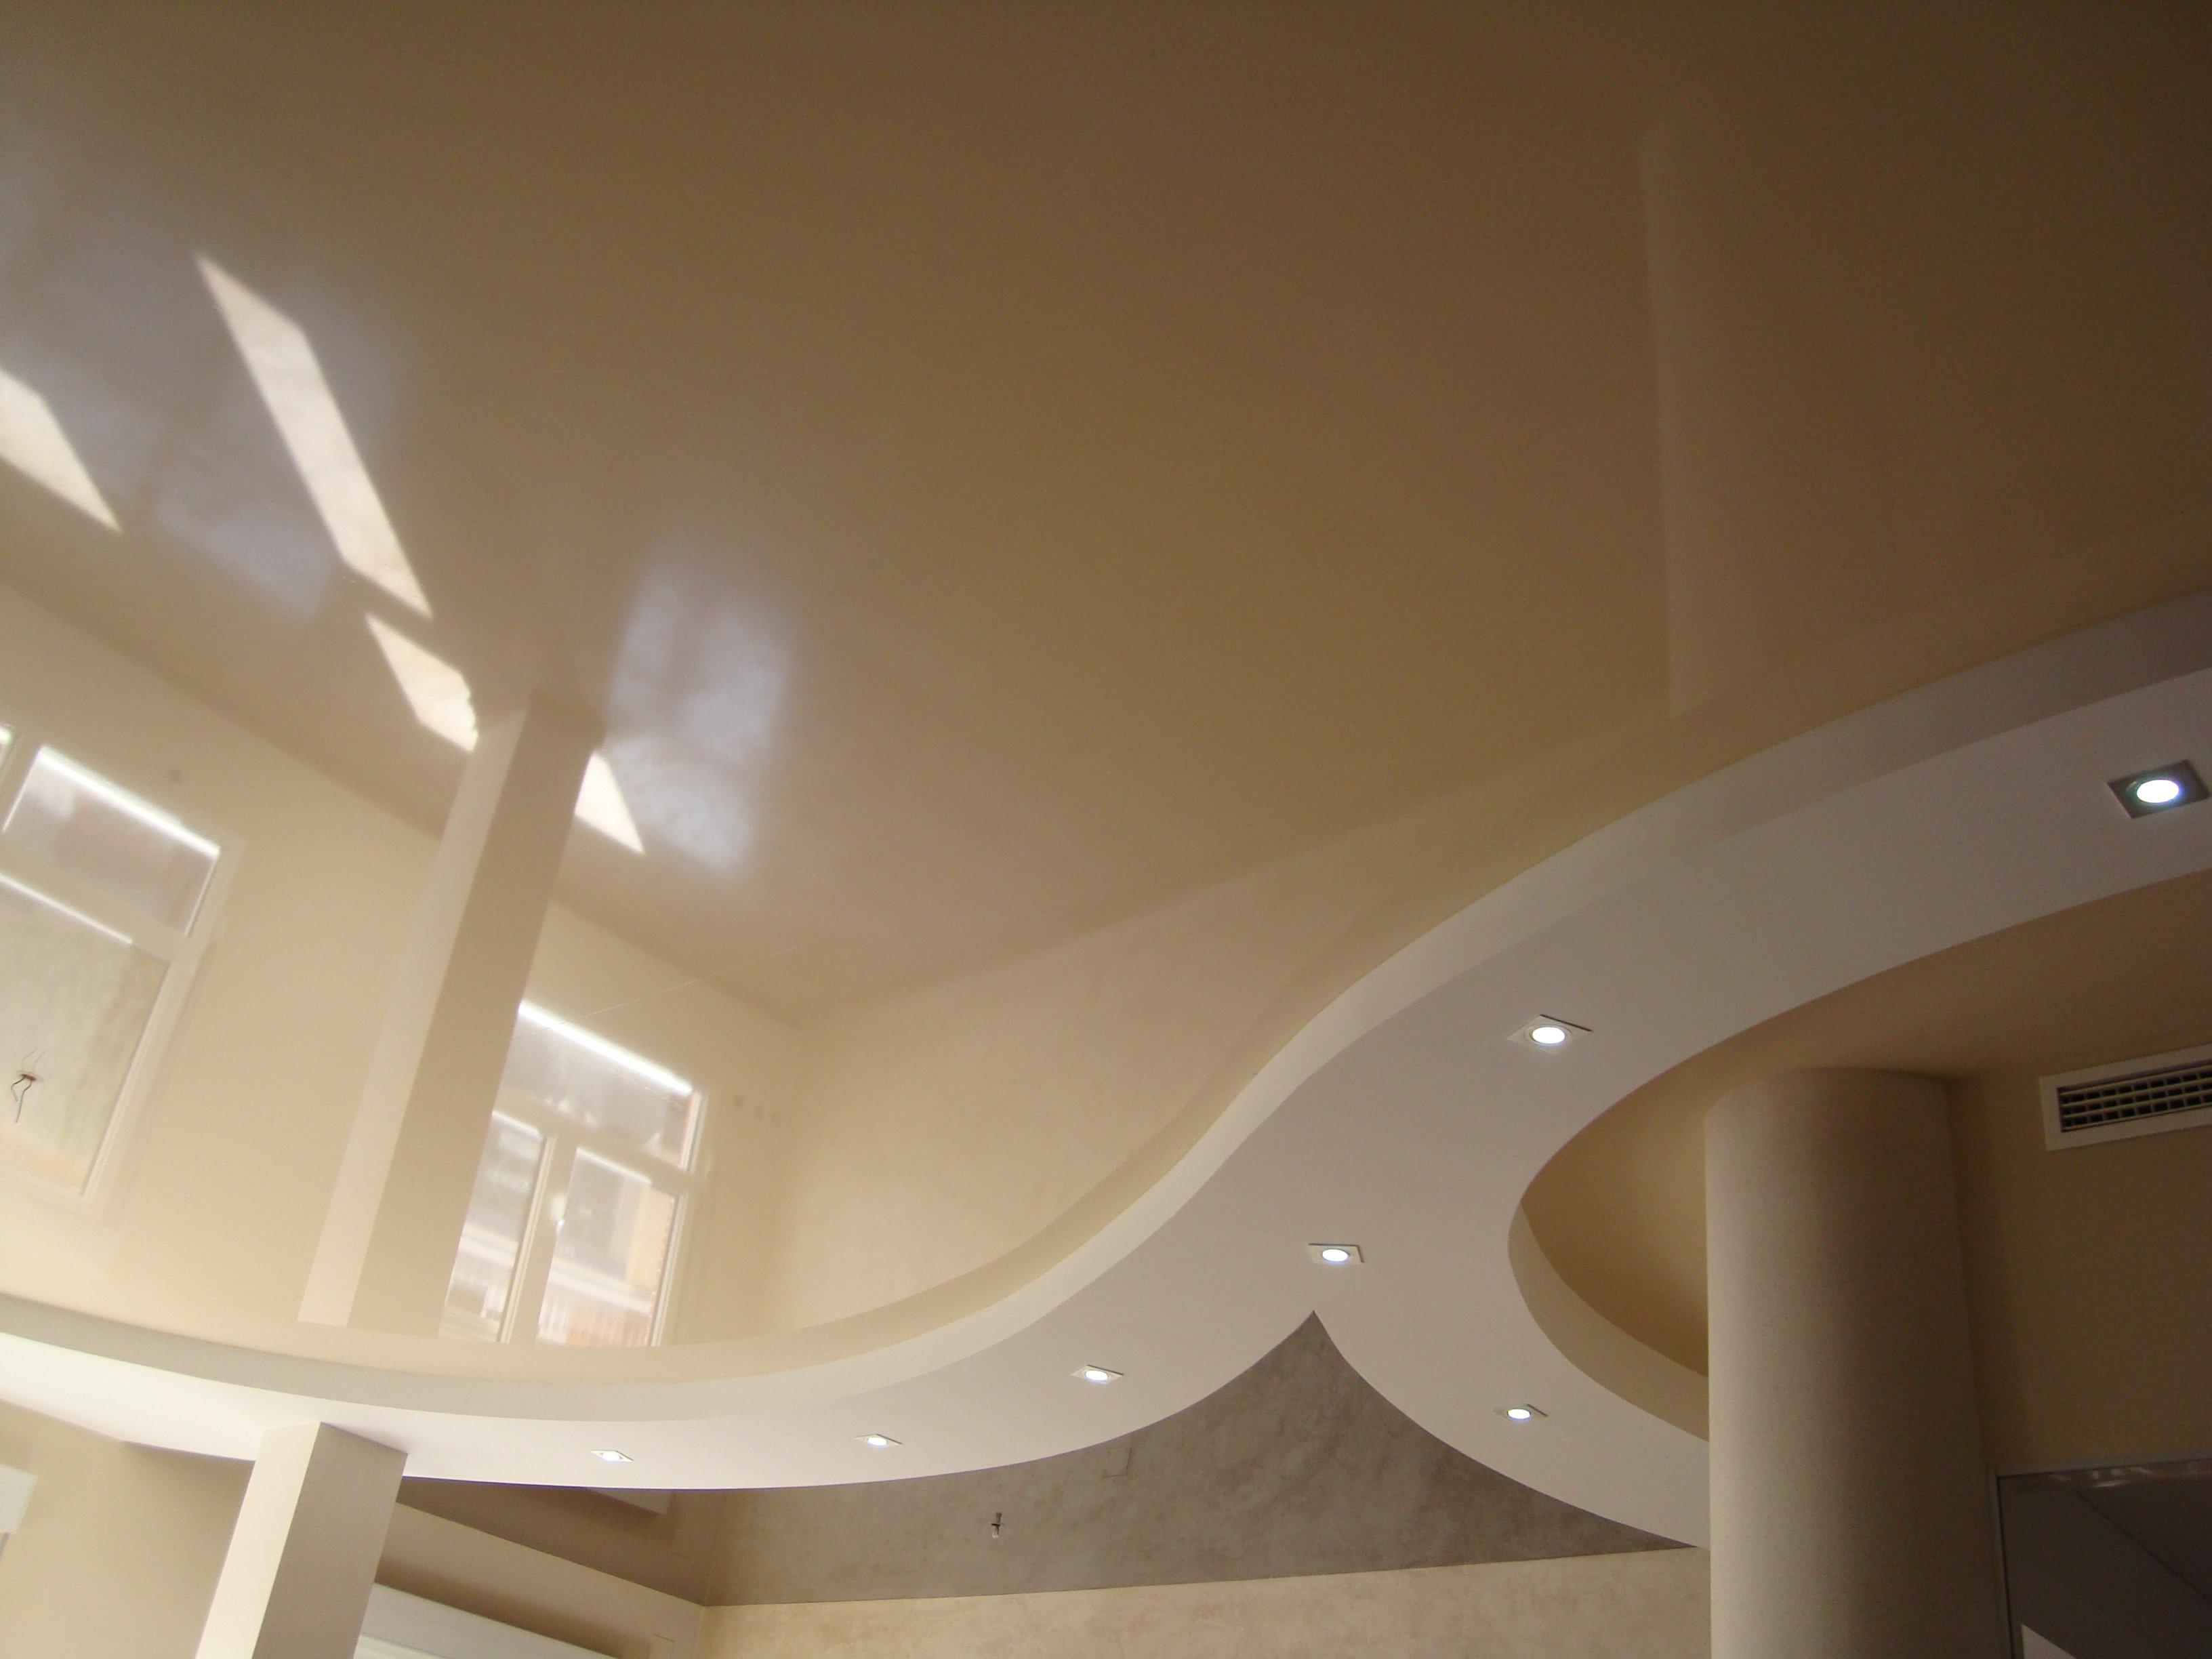 5 montador de pladur madrid - Techos registrables pladur ...